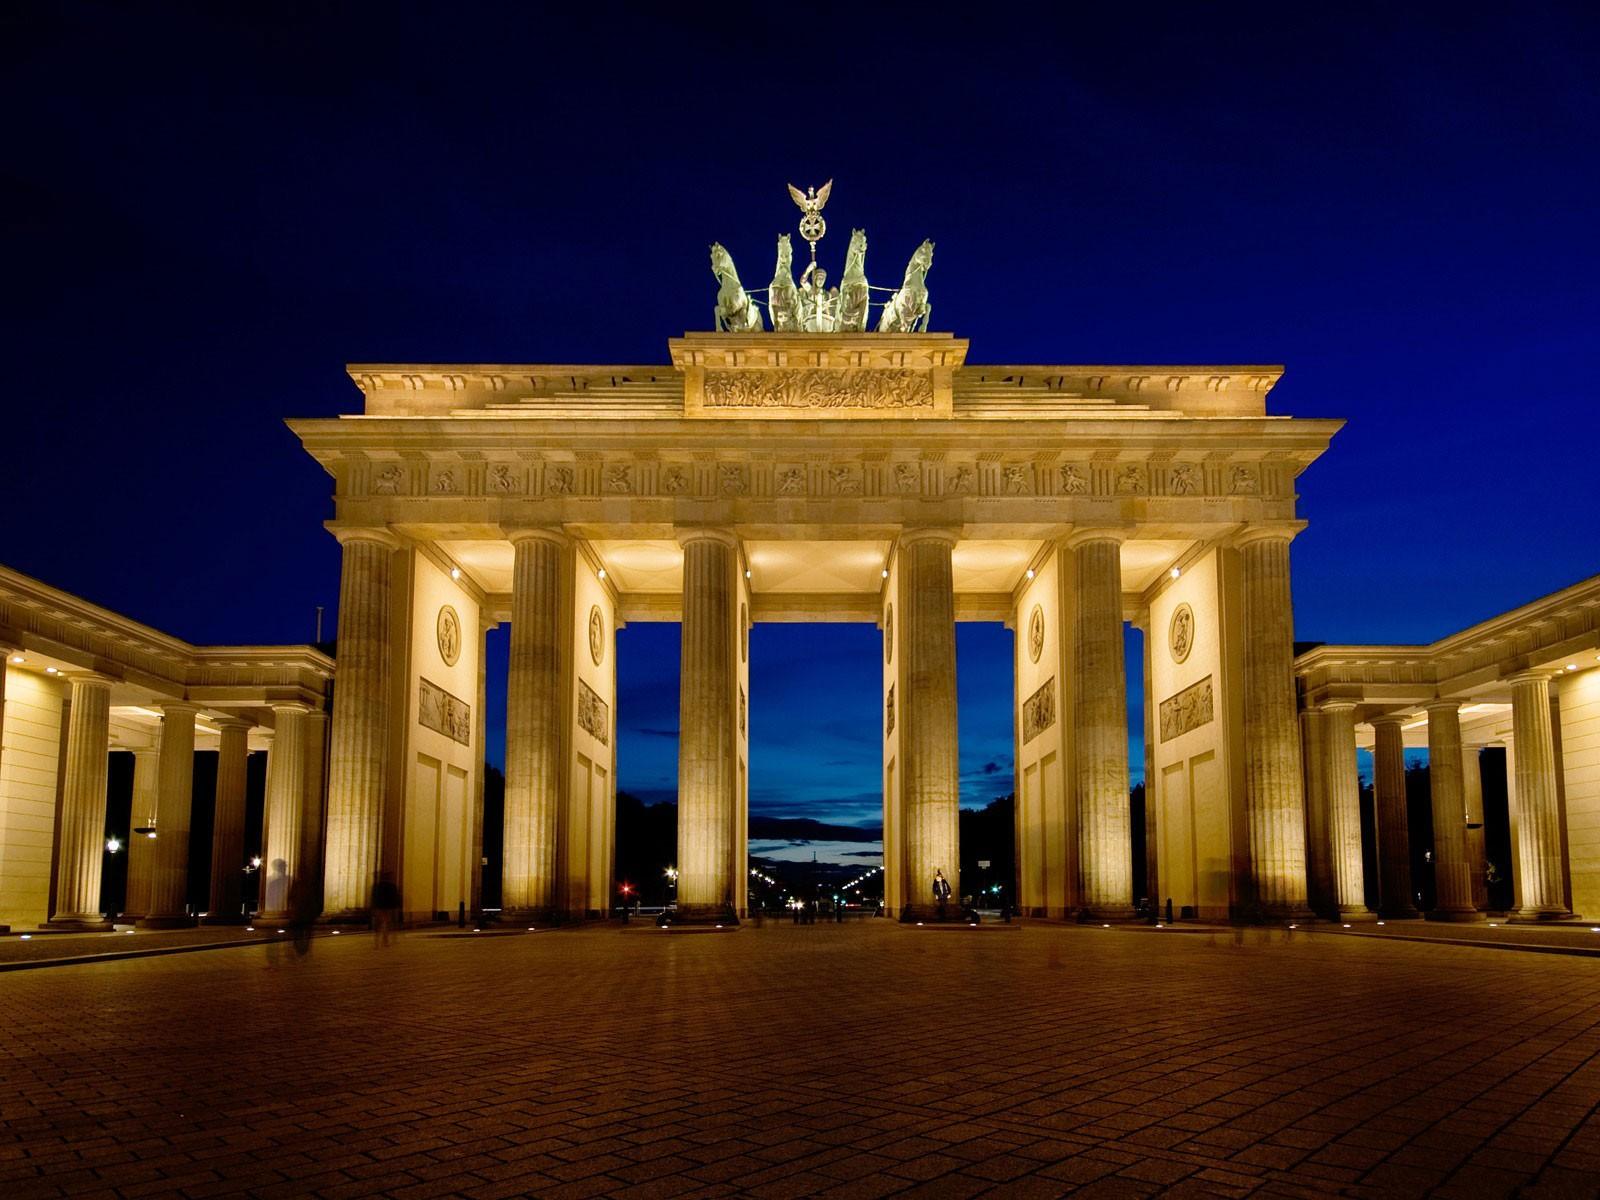 Brandenburg Gate Wallpaper 1600x1200 ID51618 1600x1200